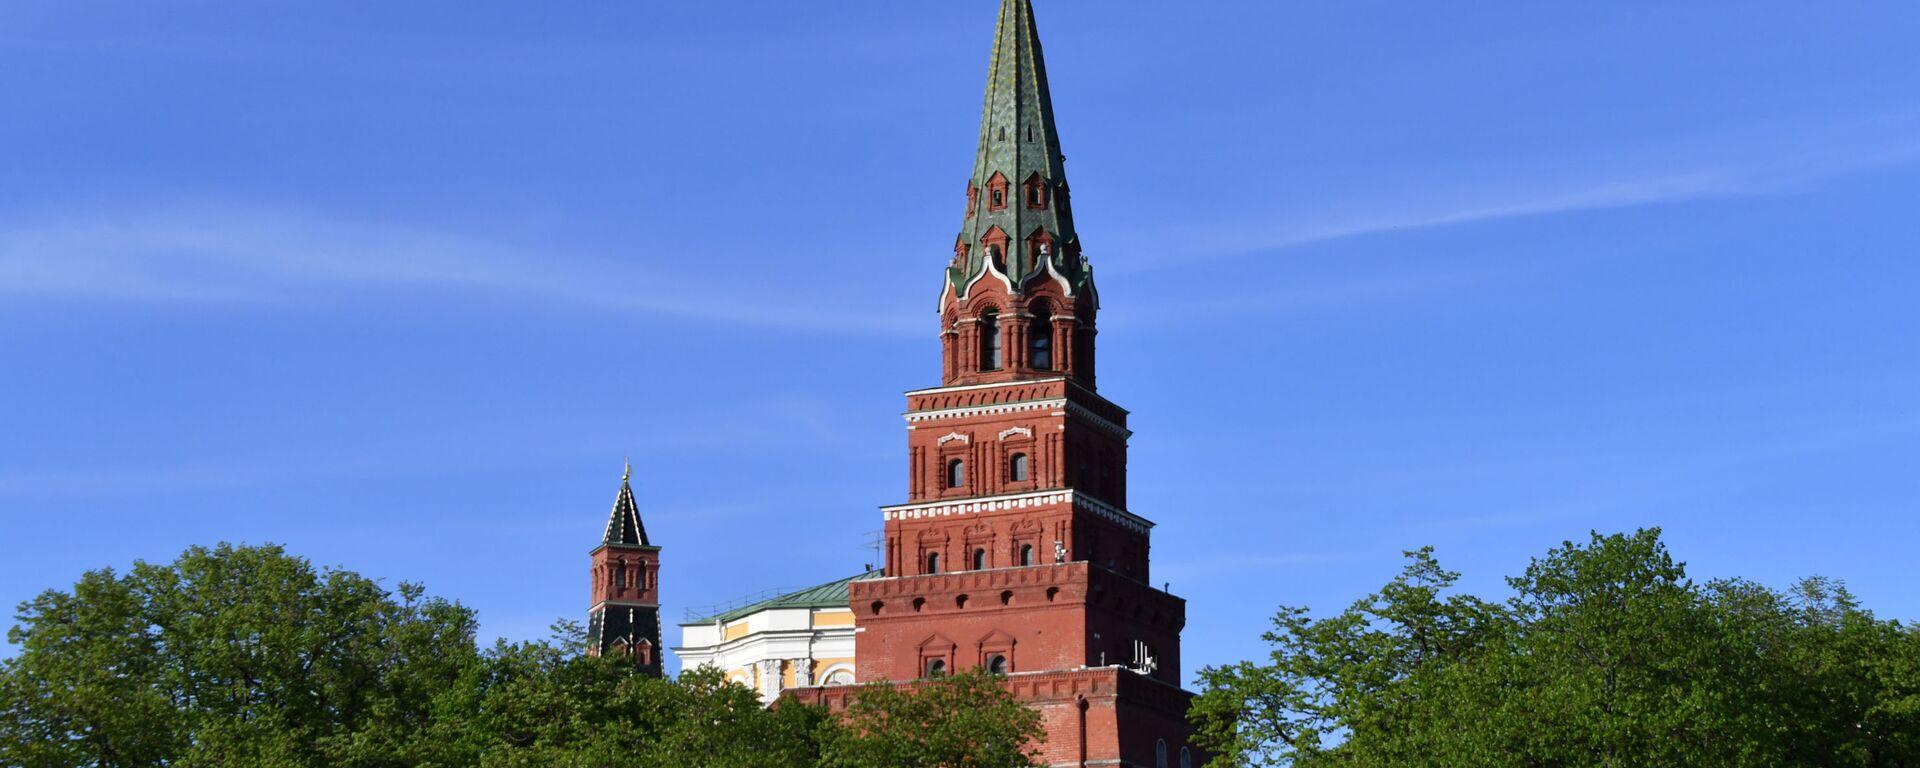 El Kremlin de Moscú, Rusia - Sputnik Mundo, 1920, 29.07.2021